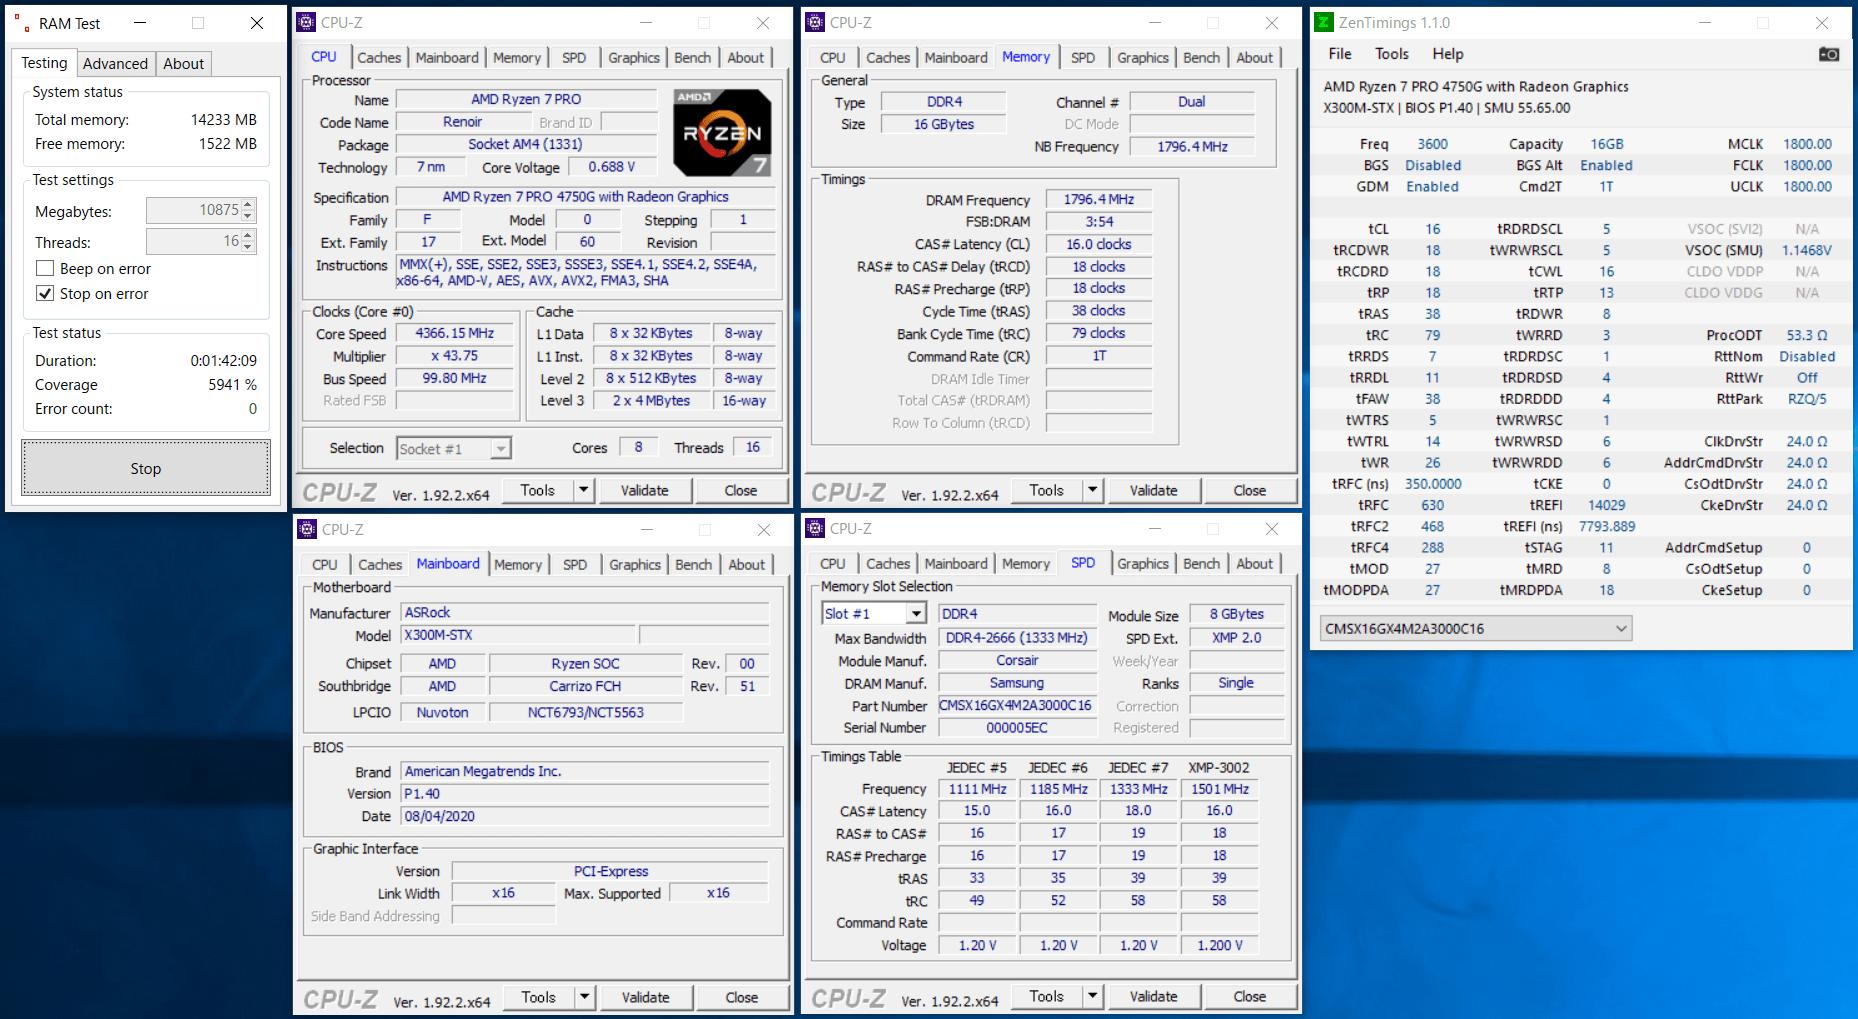 ASRock DeskMini X300_Ramtest_Corsair Vengeance SODIMM